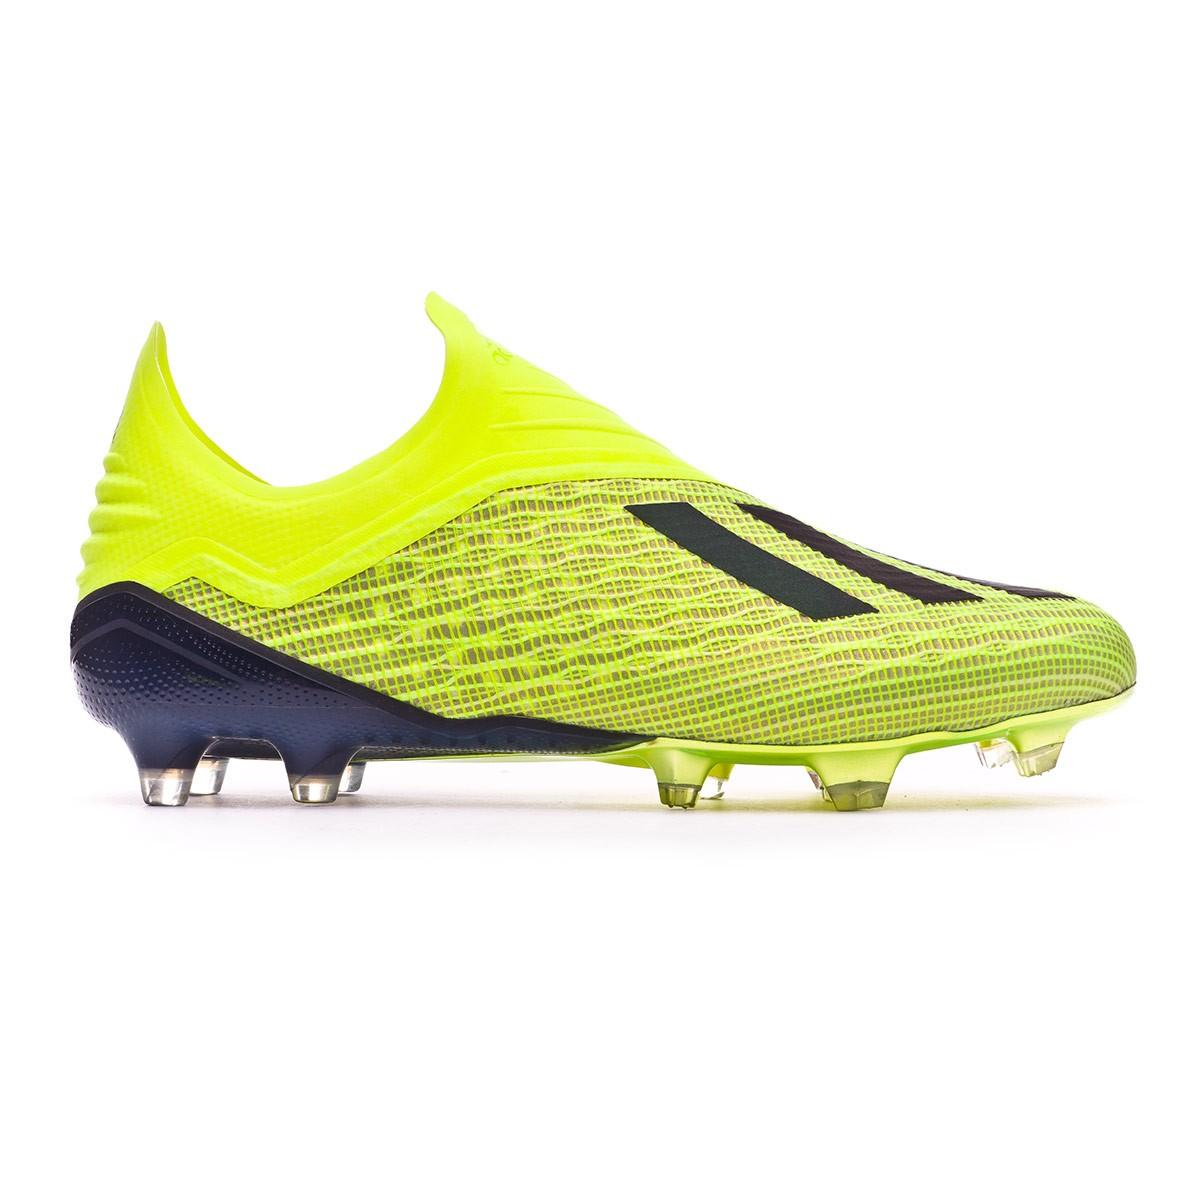 a20df984b3ad Football Boots adidas X 18+ FG Solar yellow-Core black-White - Tienda de  fútbol Fútbol Emotion